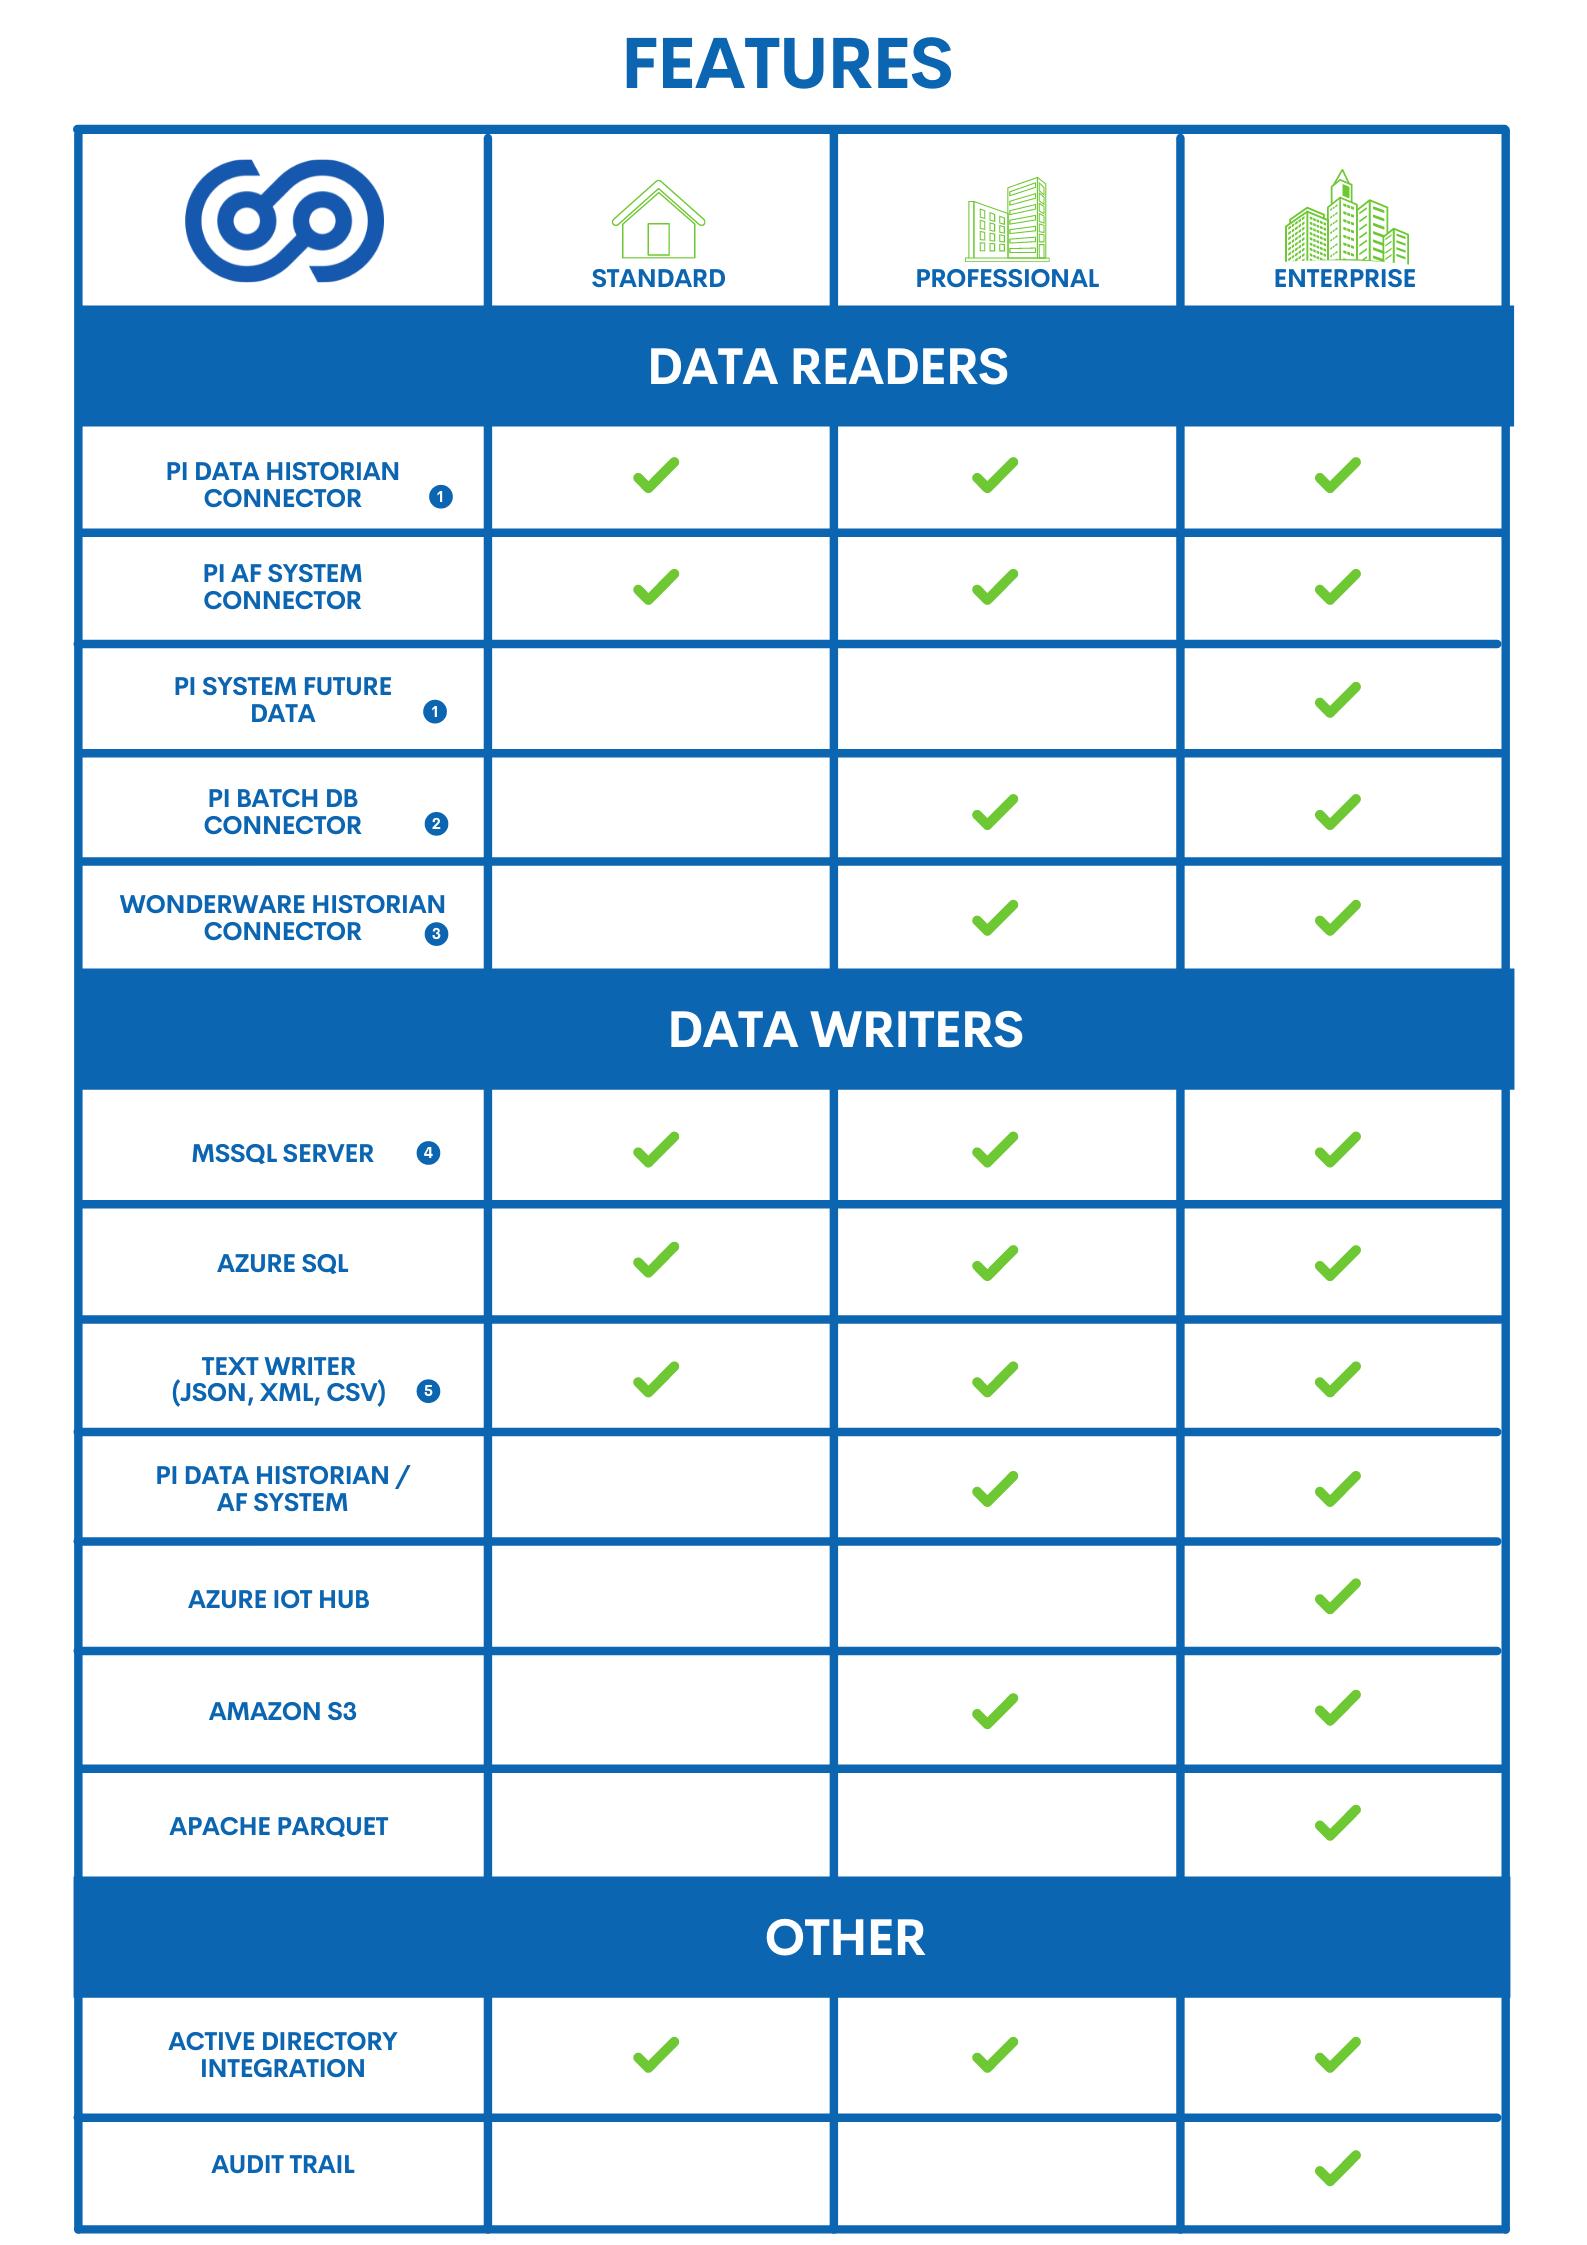 ODIN Features OSI PI data historian